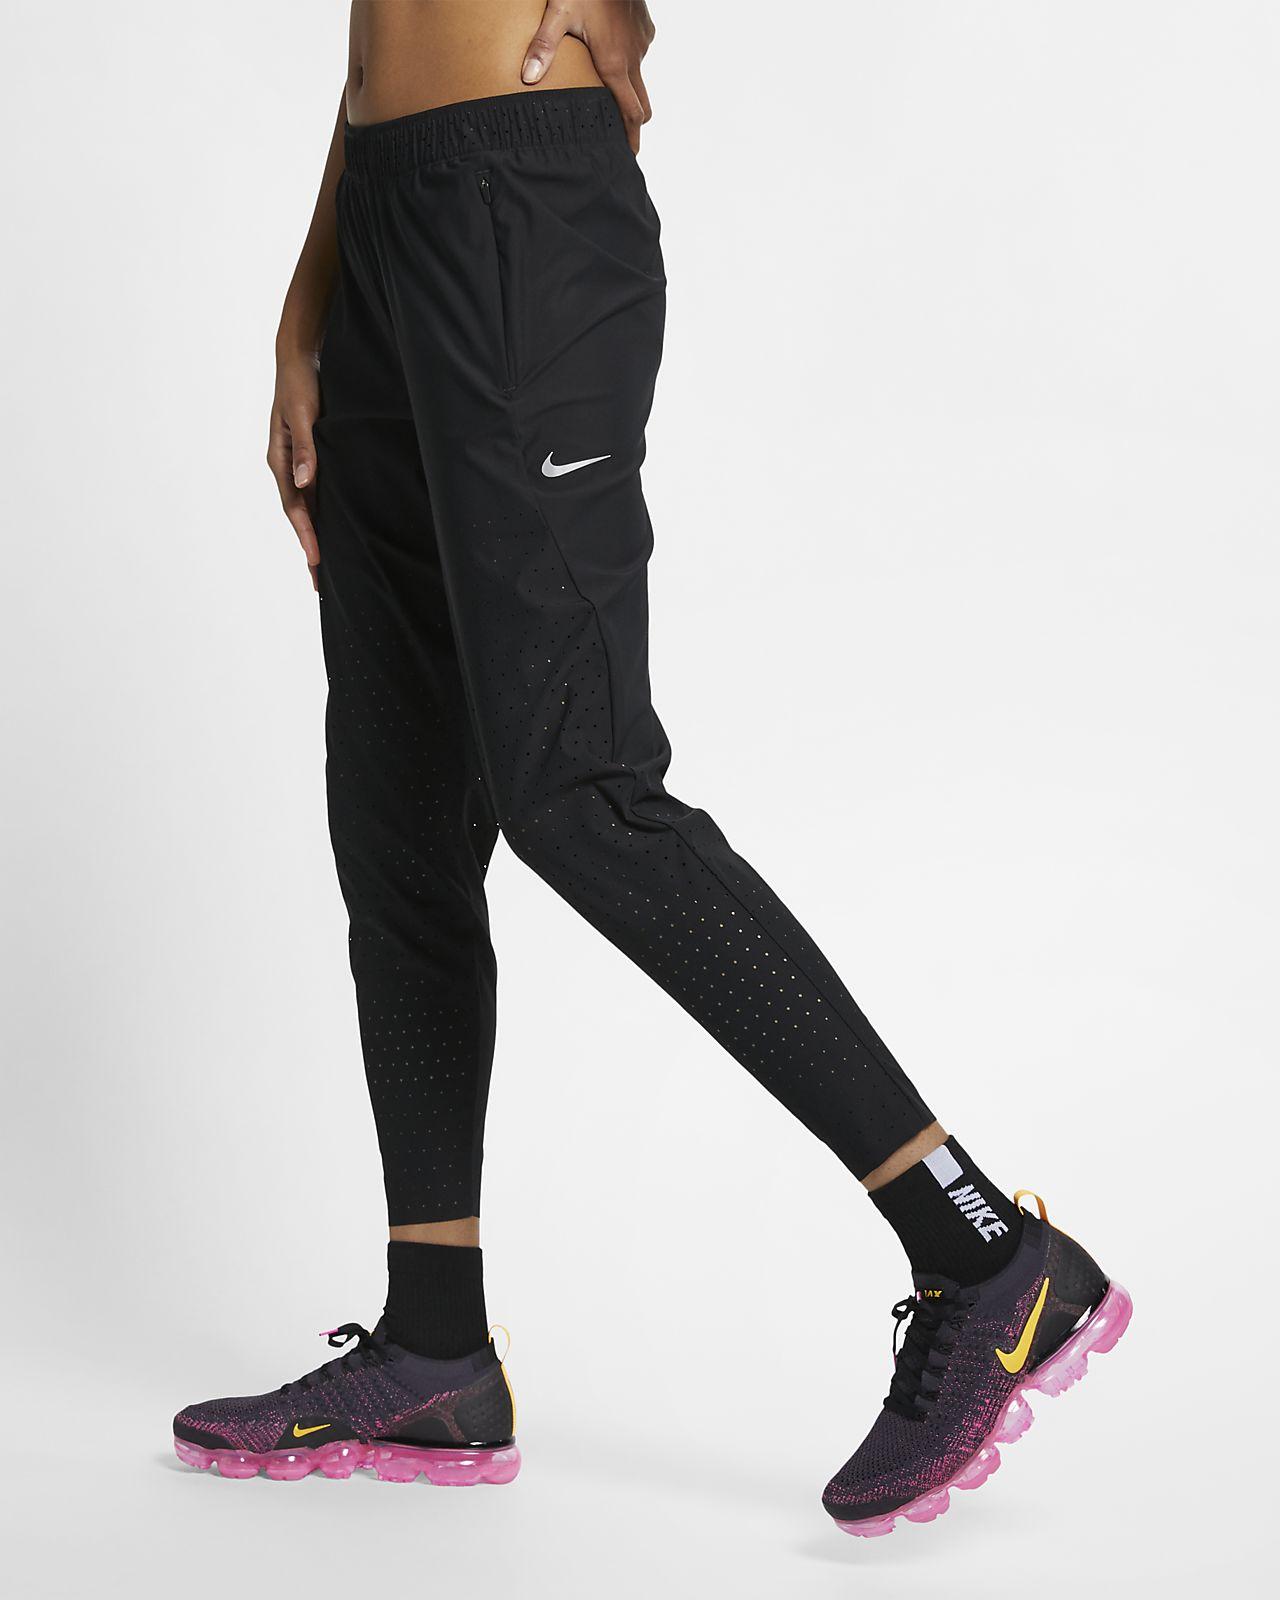 a4de1229987a Low Resolution Nike Swift női futónadrág Nike Swift női futónadrág